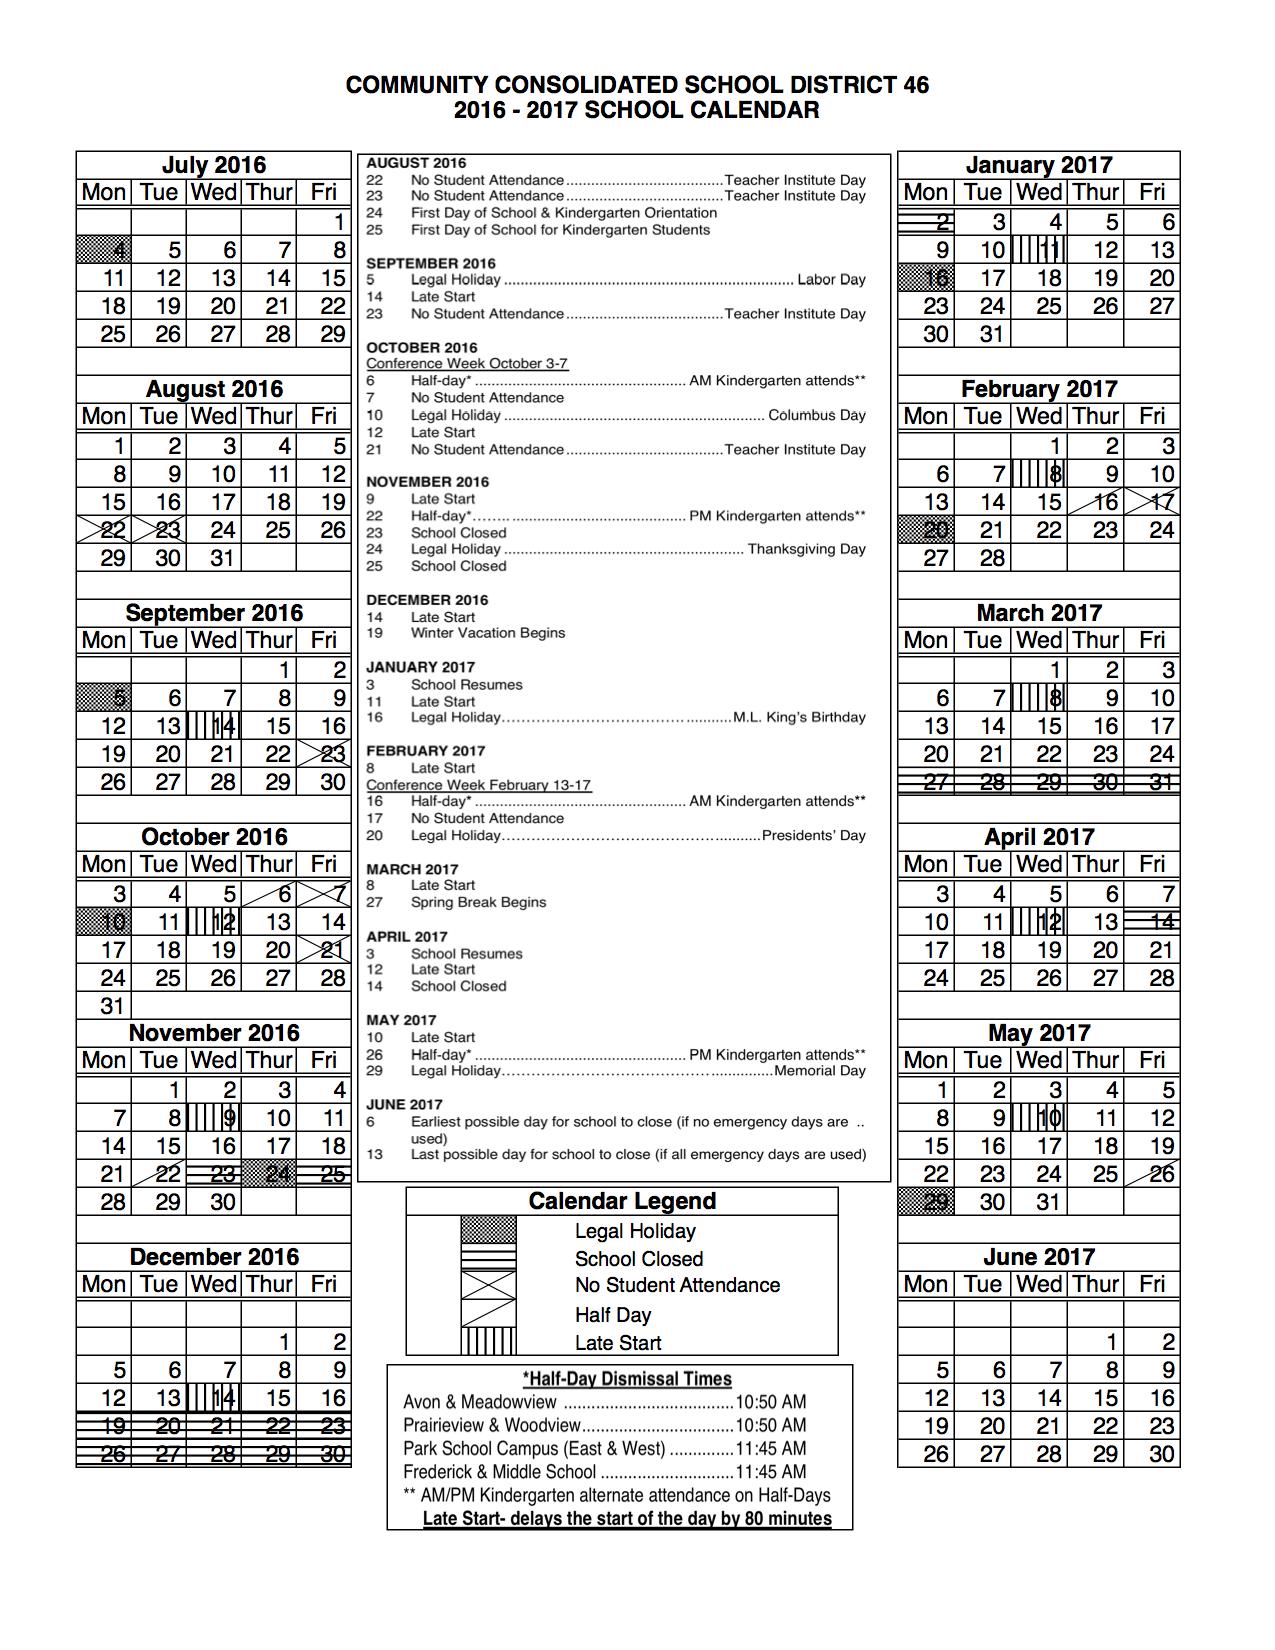 fy17 calendar